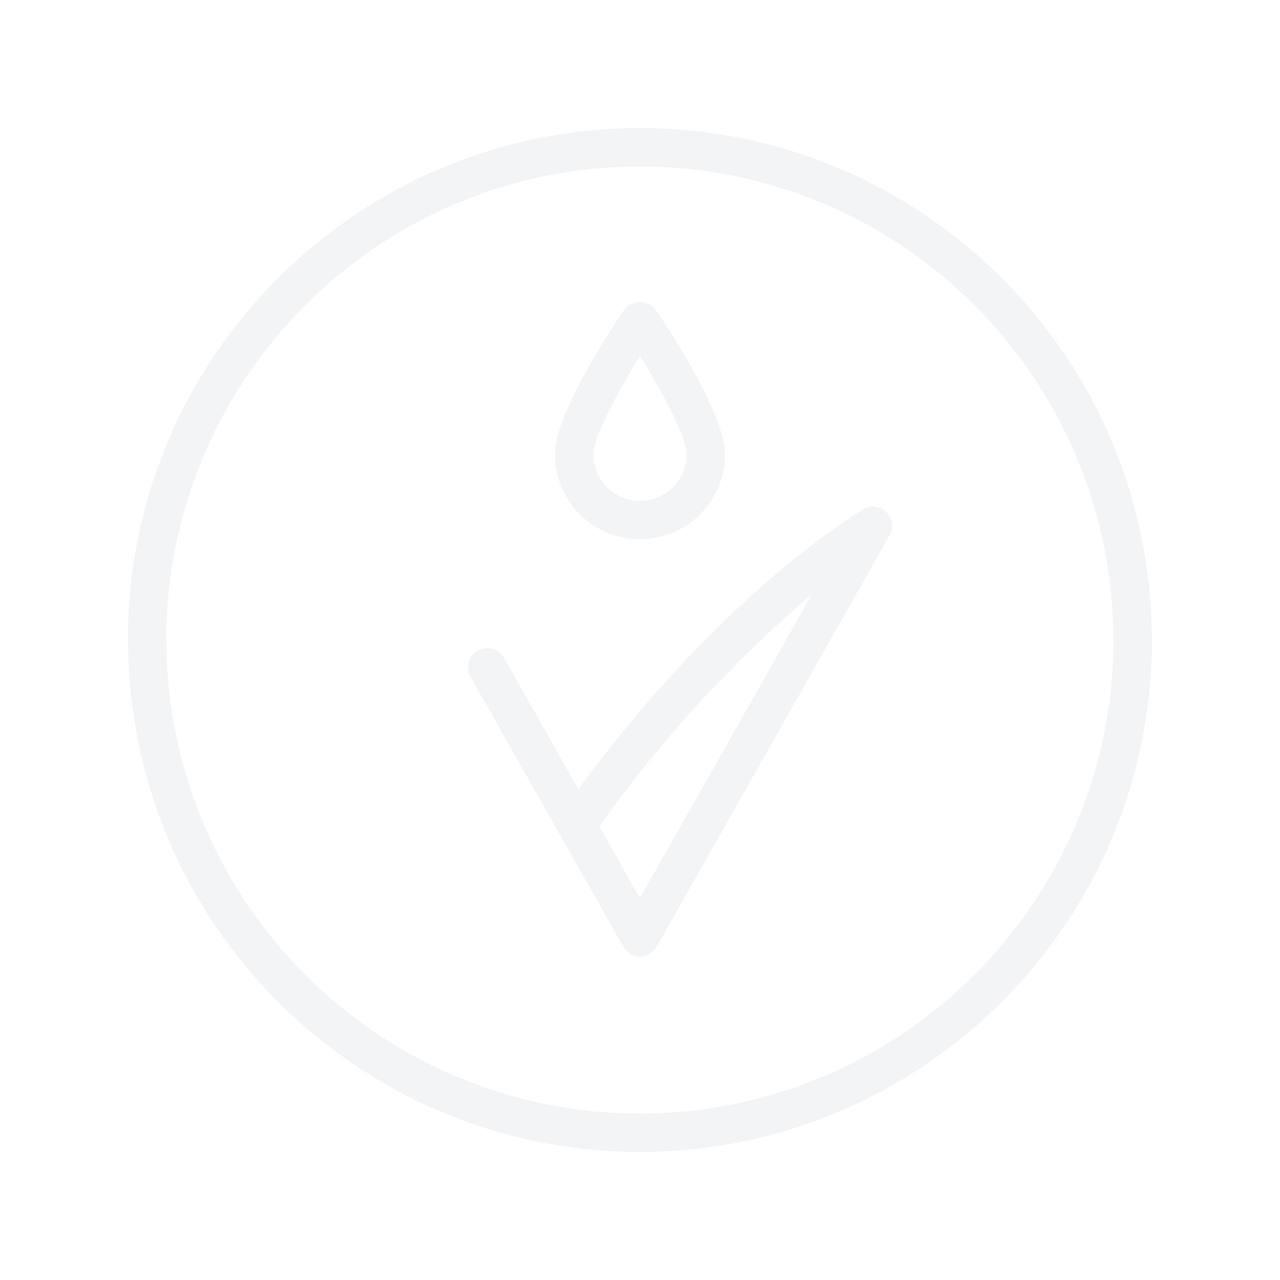 PAYOT Uni Skin Illuminating Perfecting Serum совершенствующая сыворотка 30ml